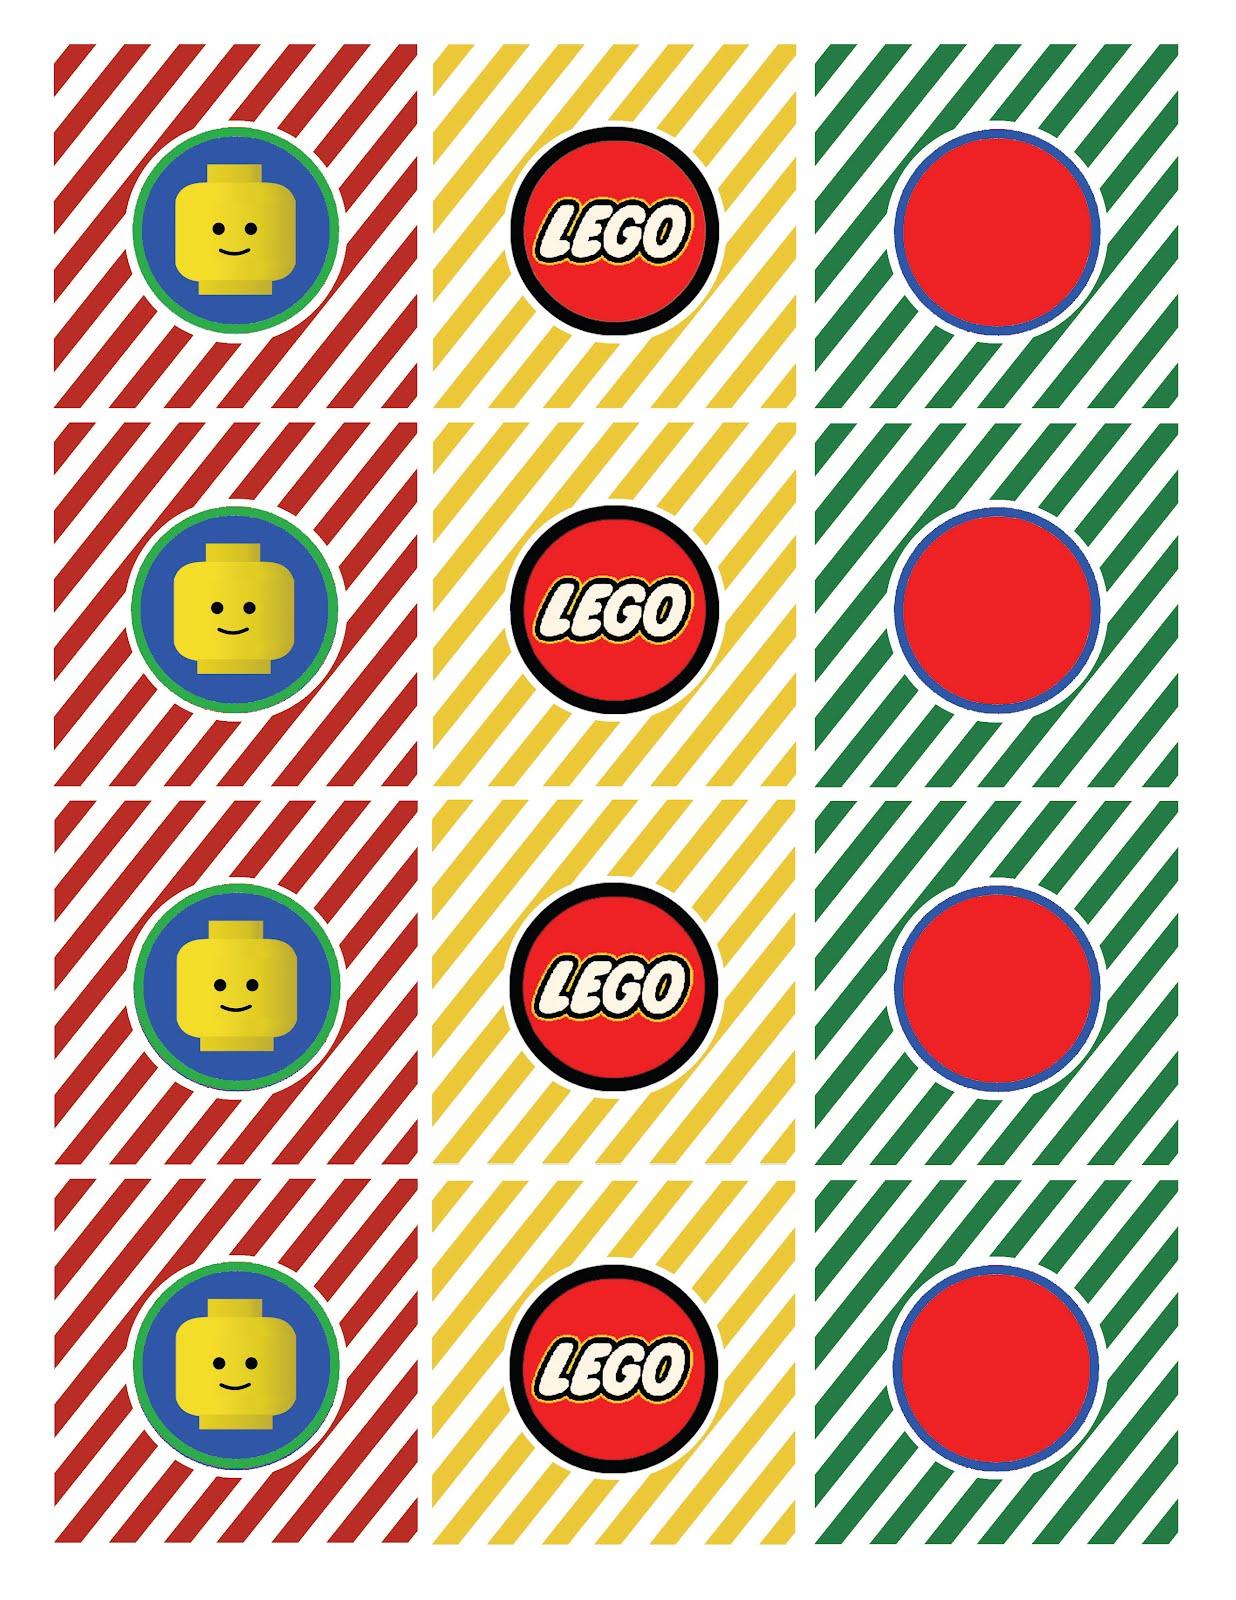 Printable Birthday Cards – Printable Lego Birthday Cards